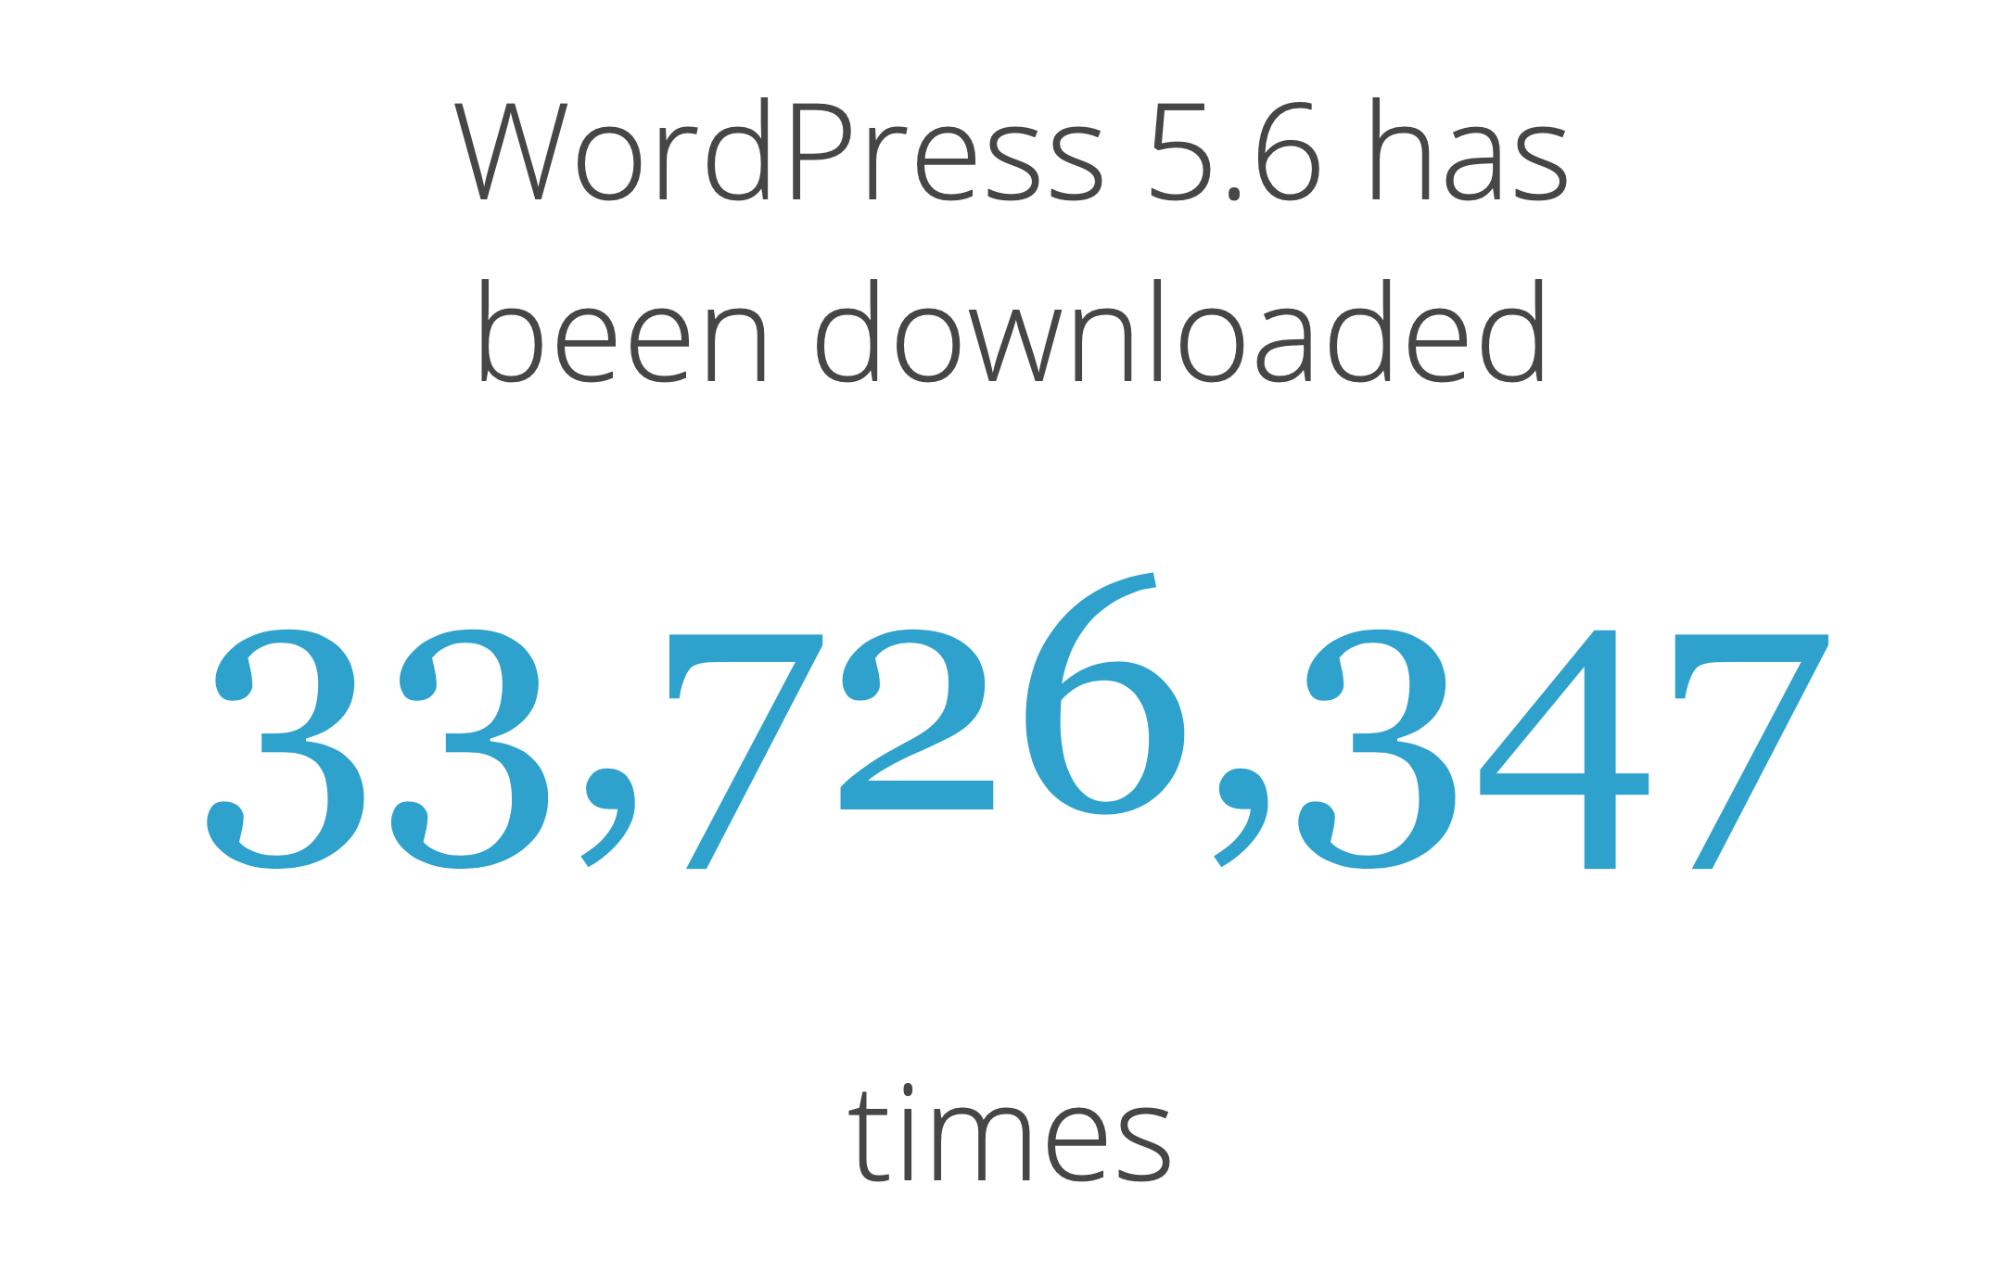 WordPress version 5.6 download numbers